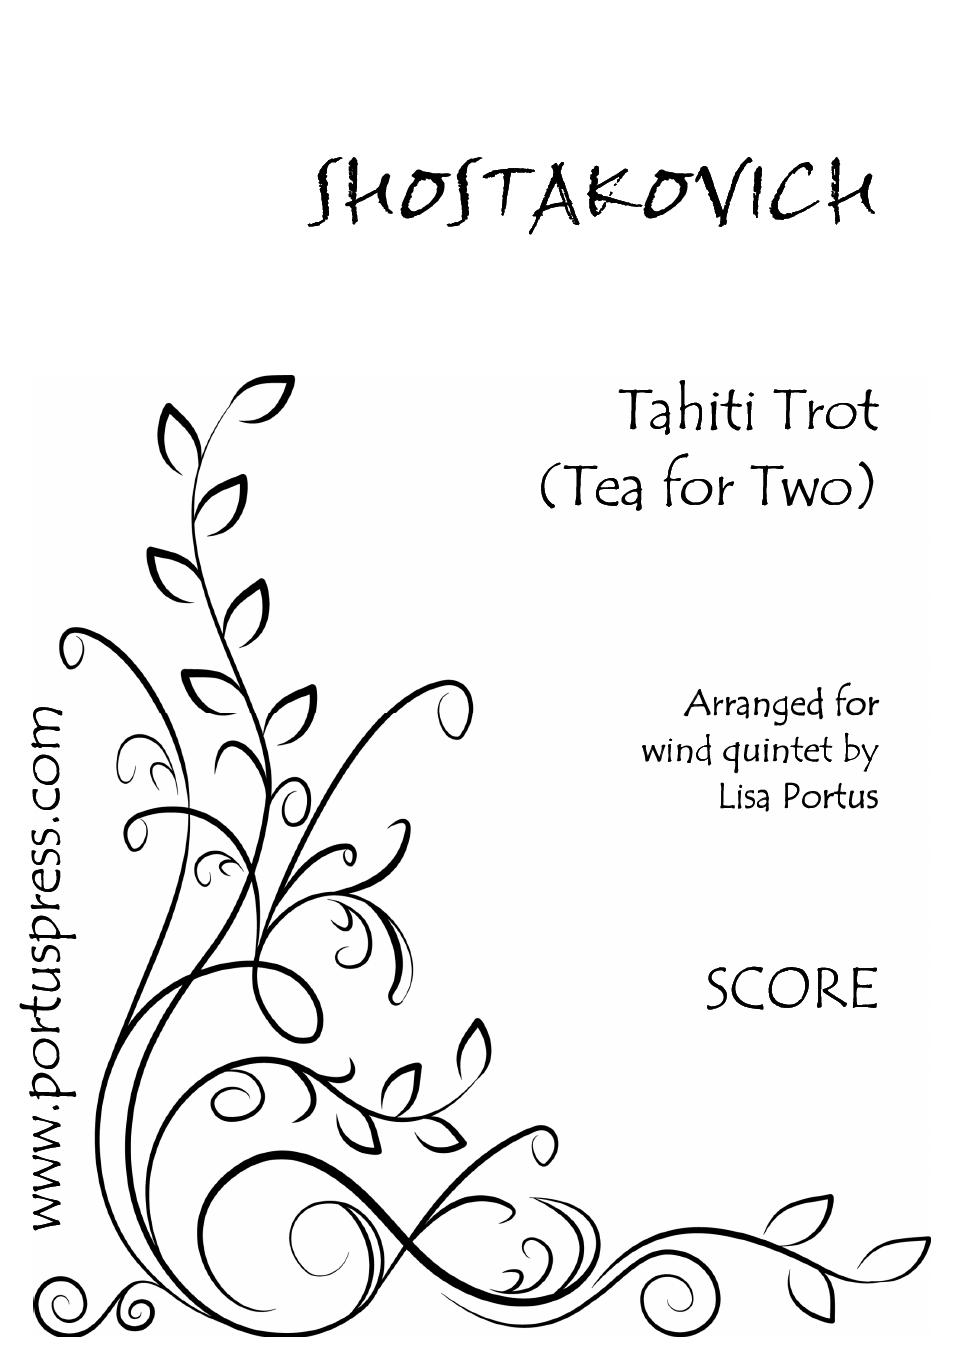 Shostakovich: Tahiti Trot (Tea for Two)